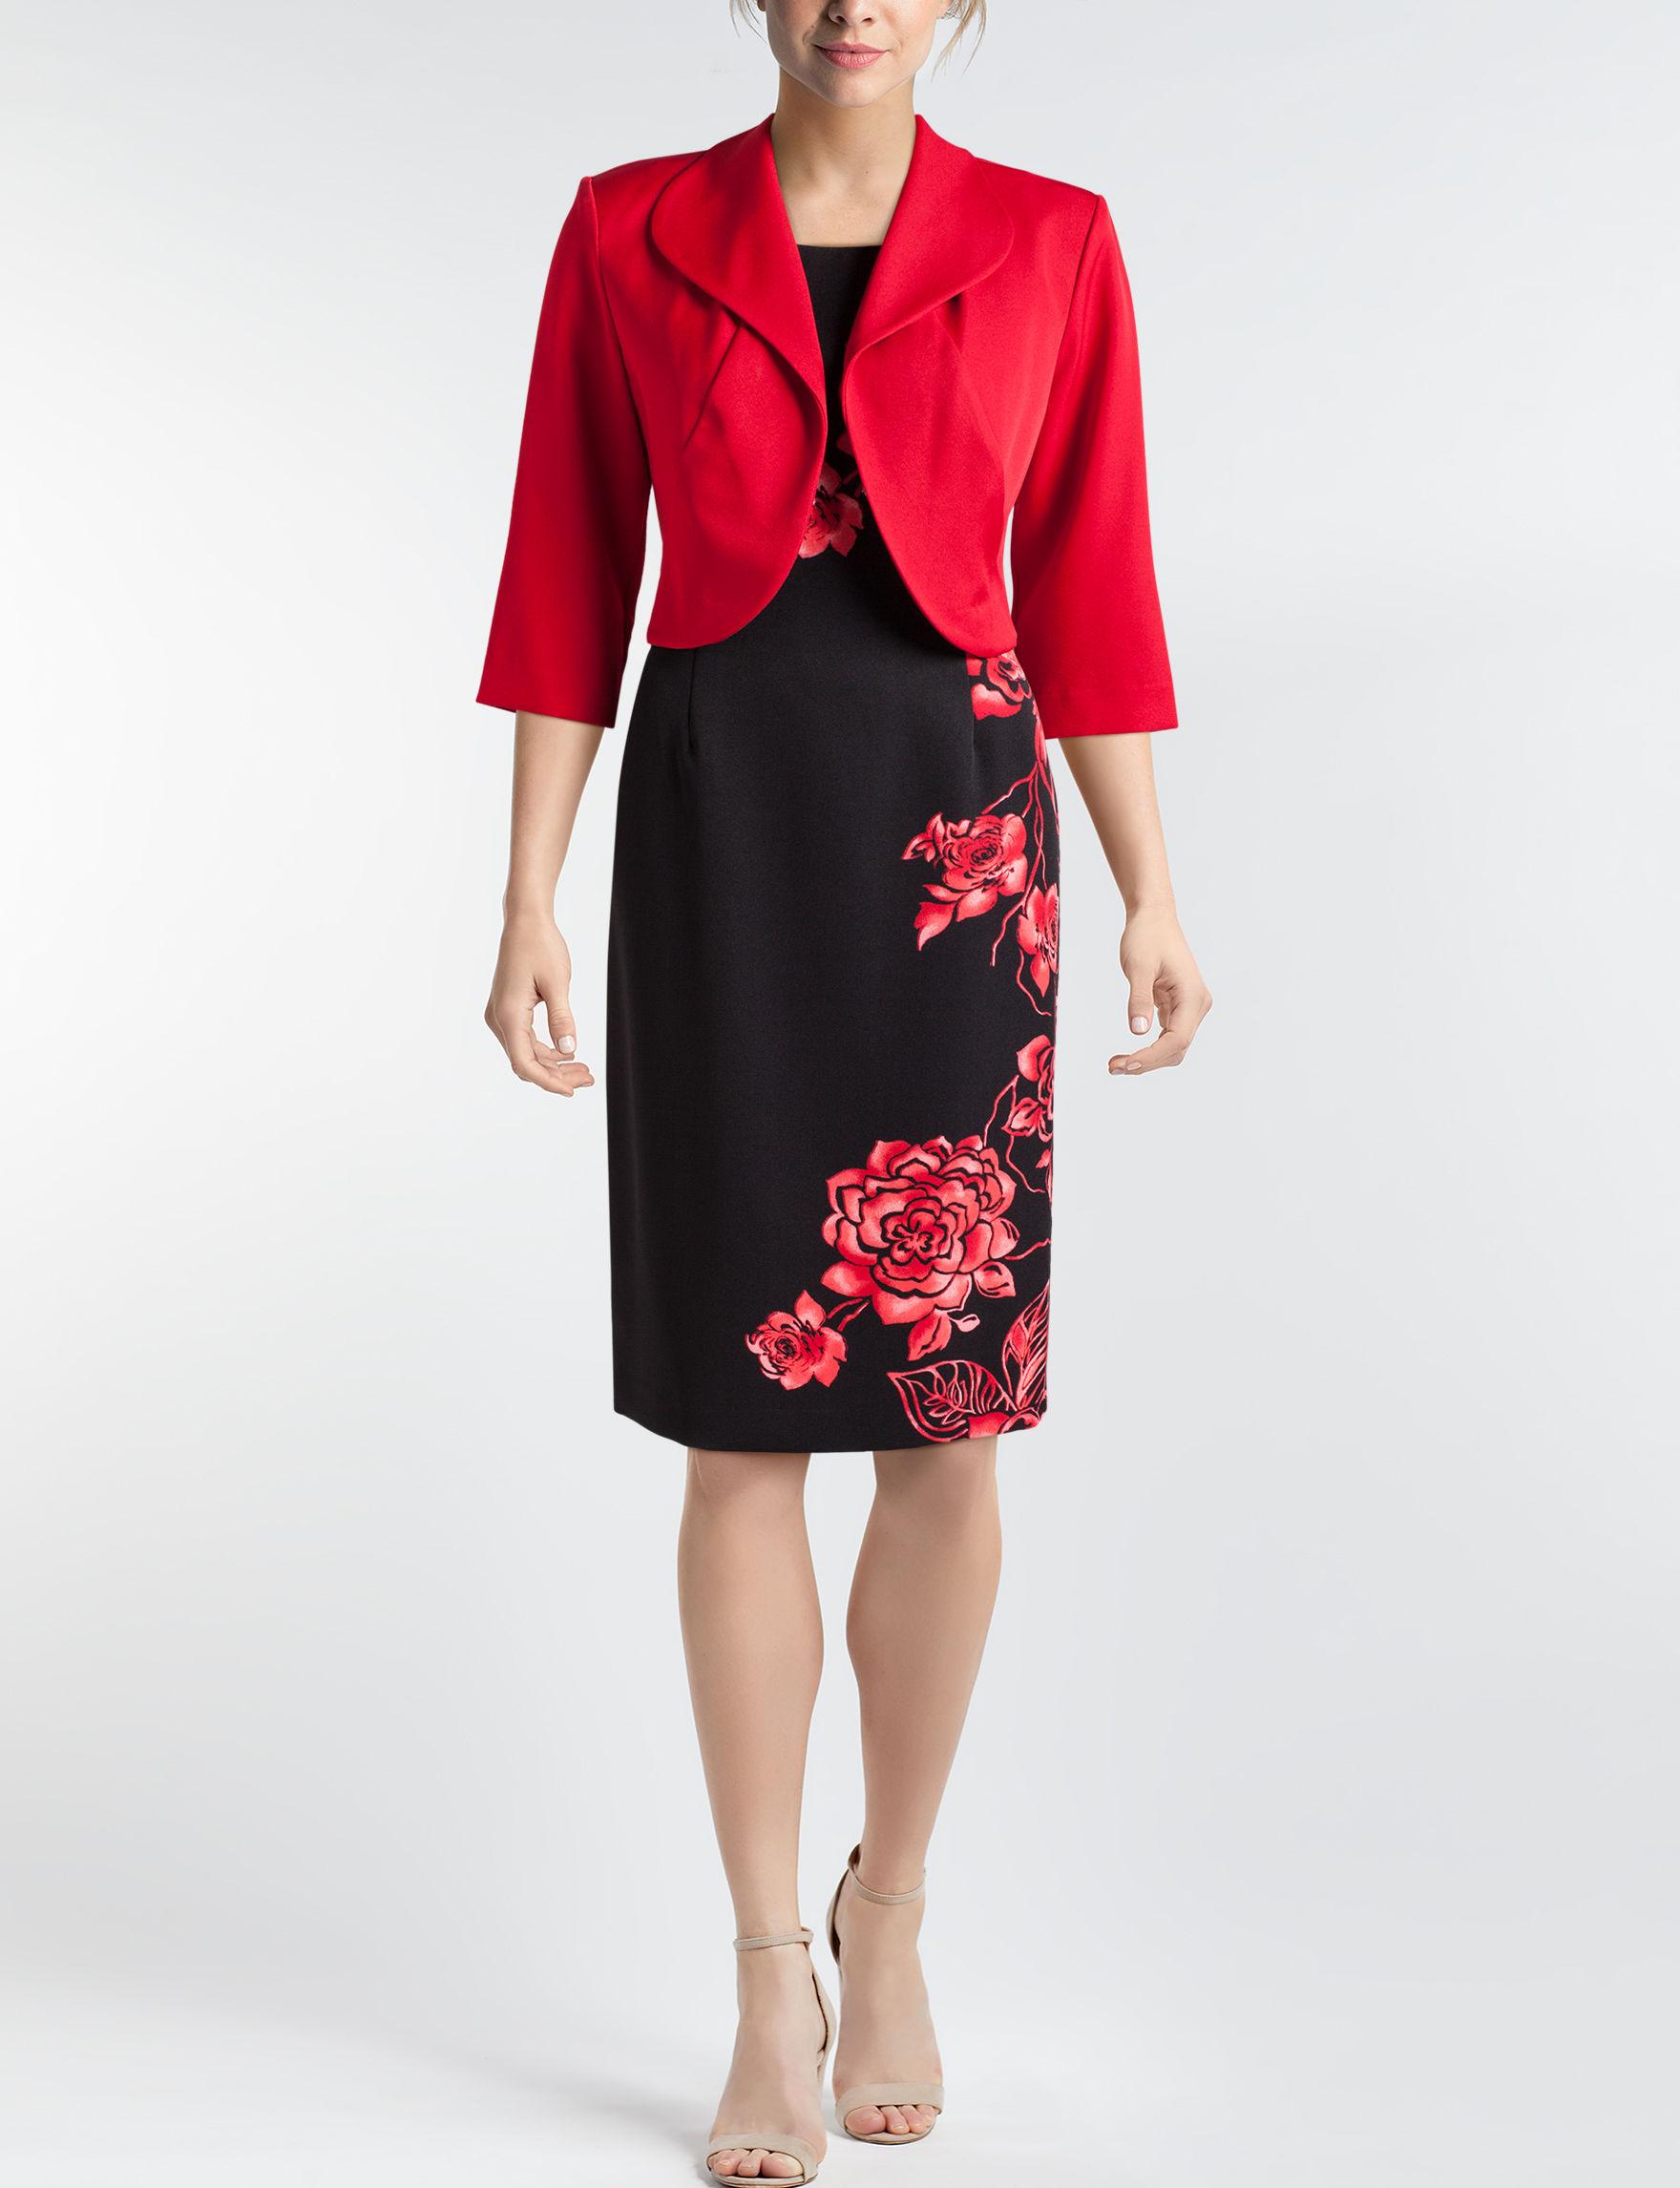 Maya Brooke Black / Red Everyday & Casual Jacket Dresses